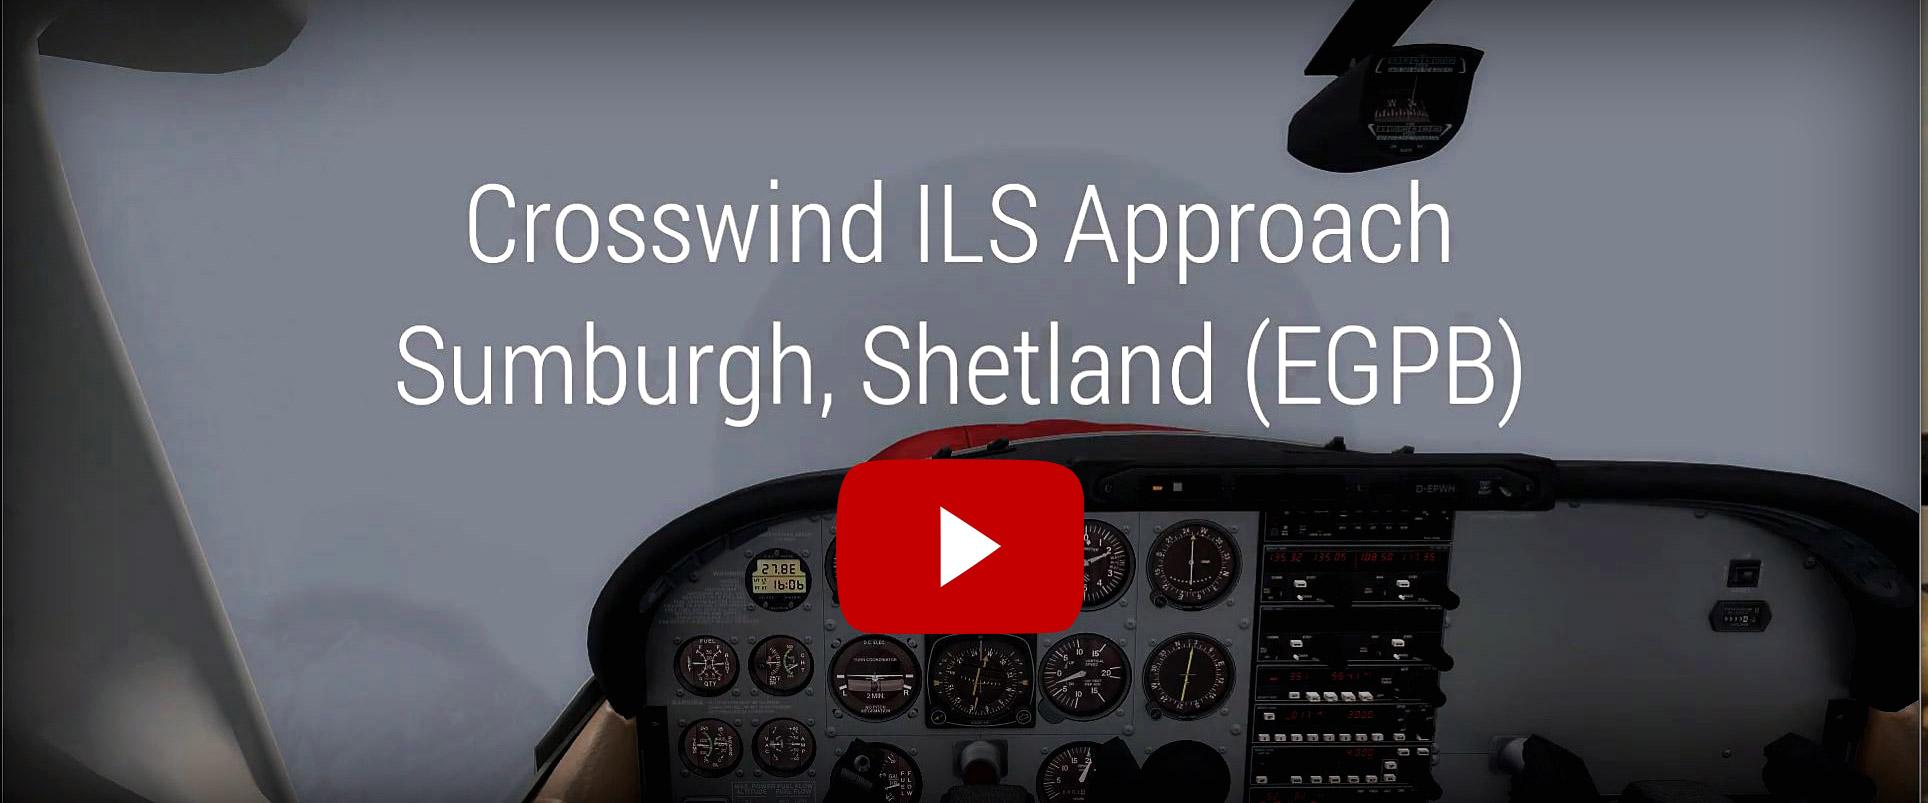 ILS Approach and Crosswind Landing in Sumburgh